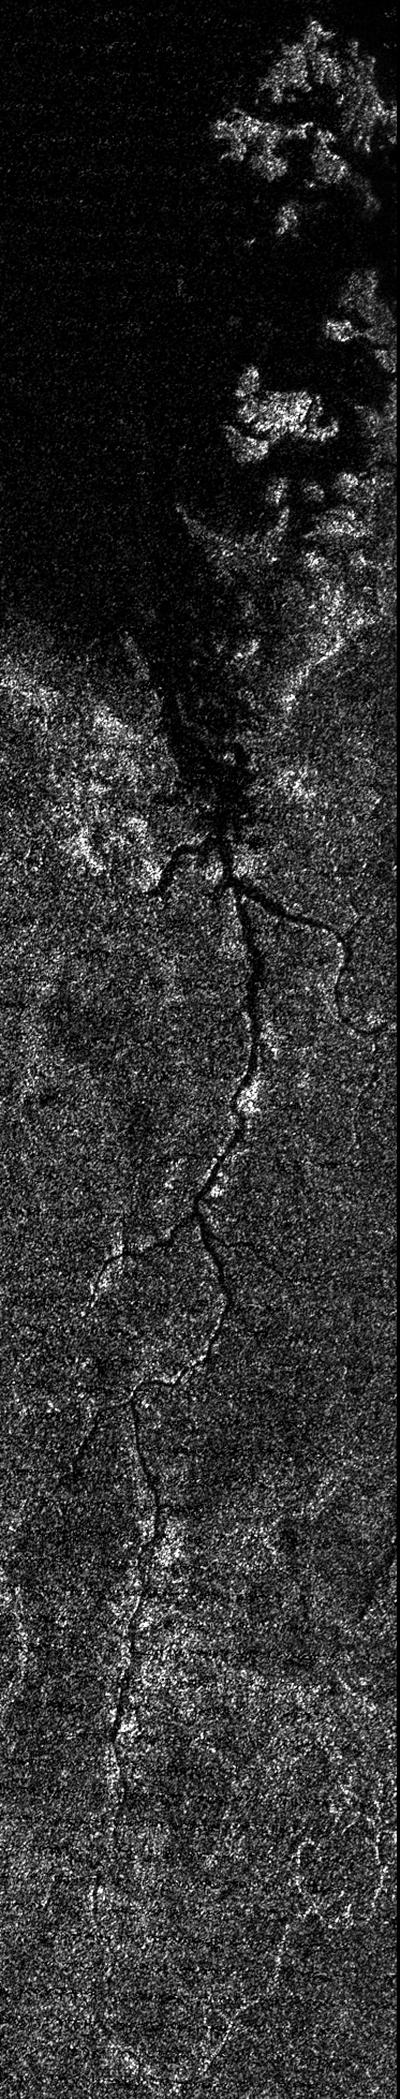 River system on Titan. (NASA/JPL-Caltech/ASI)